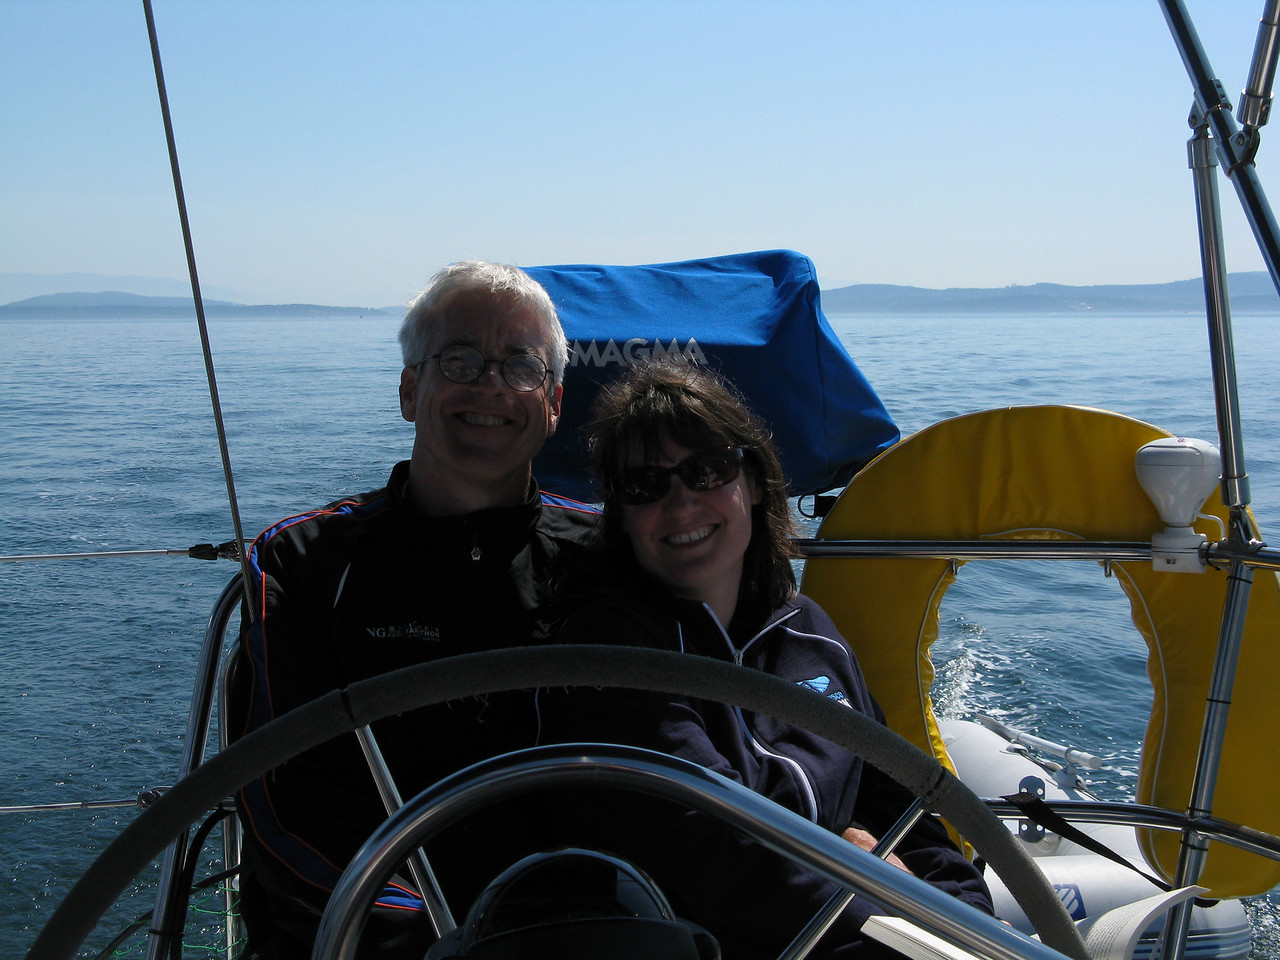 Glenn and Sonia are enjoying the sail.